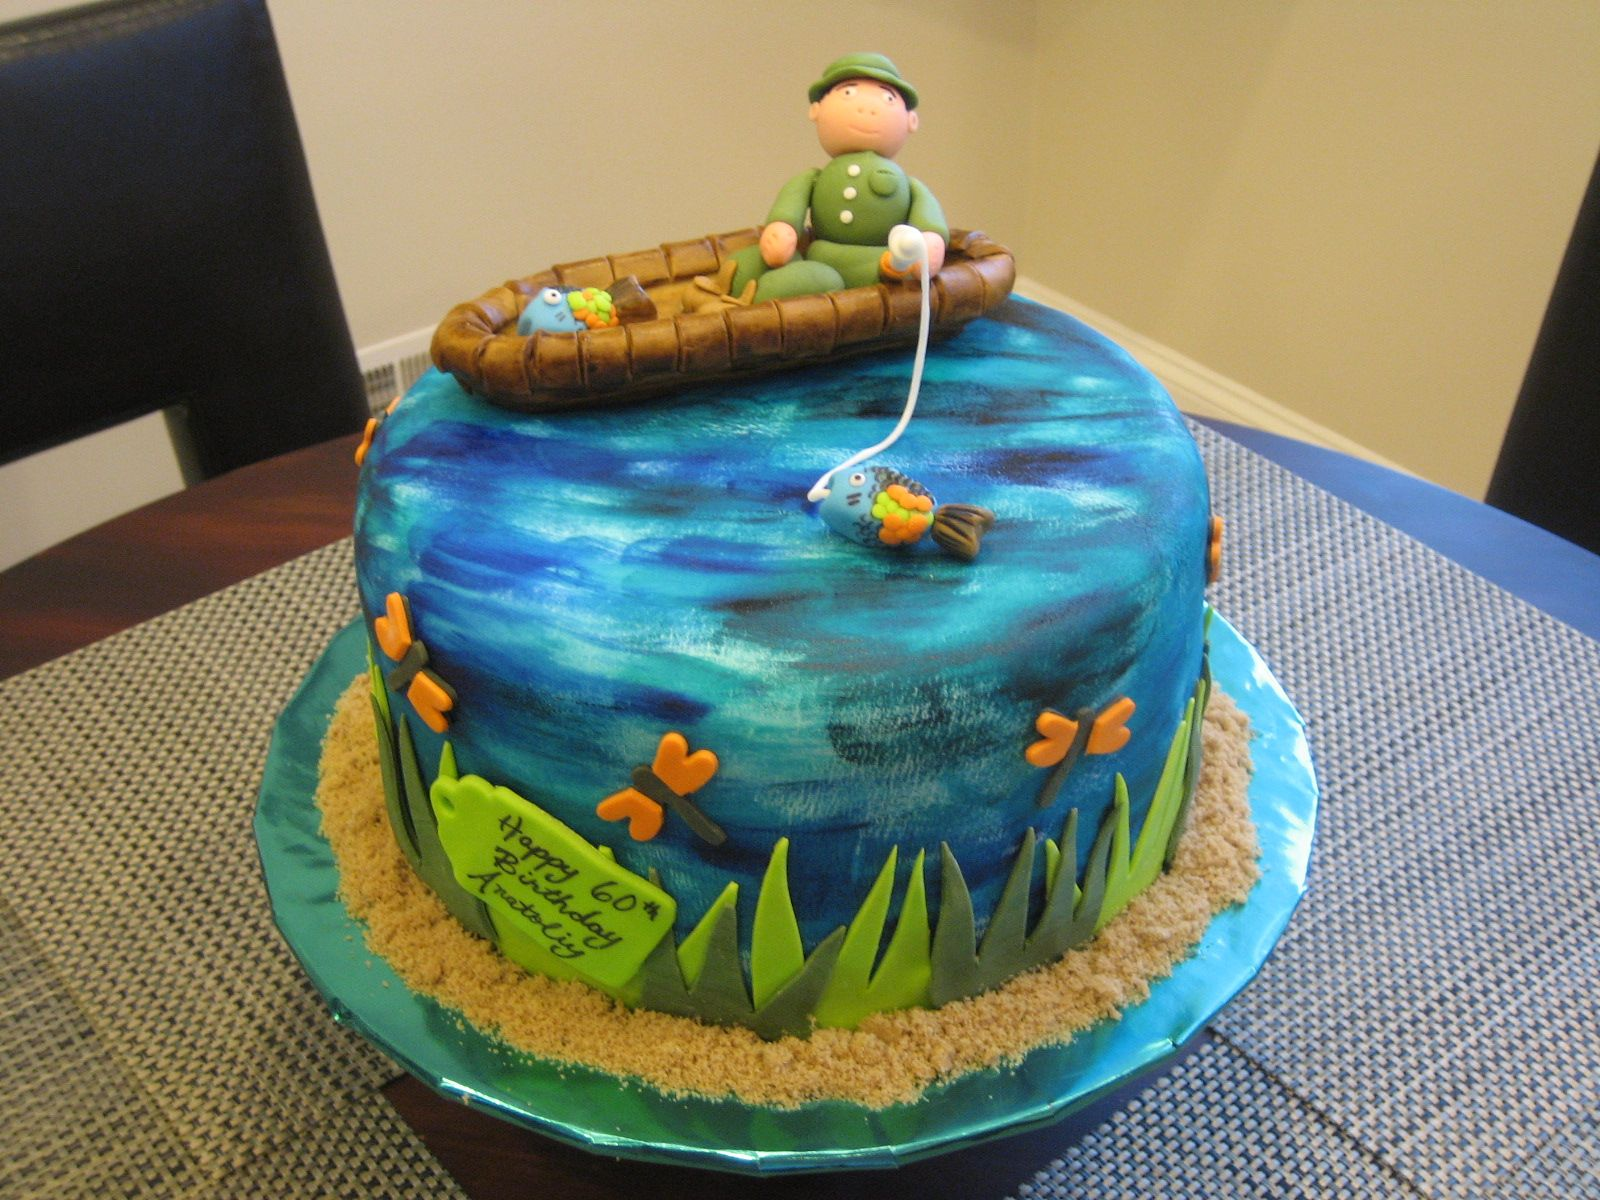 Awe Inspiring Fishing Birthday Cake Cakepins Com With Images Fish Cake Funny Birthday Cards Online Alyptdamsfinfo